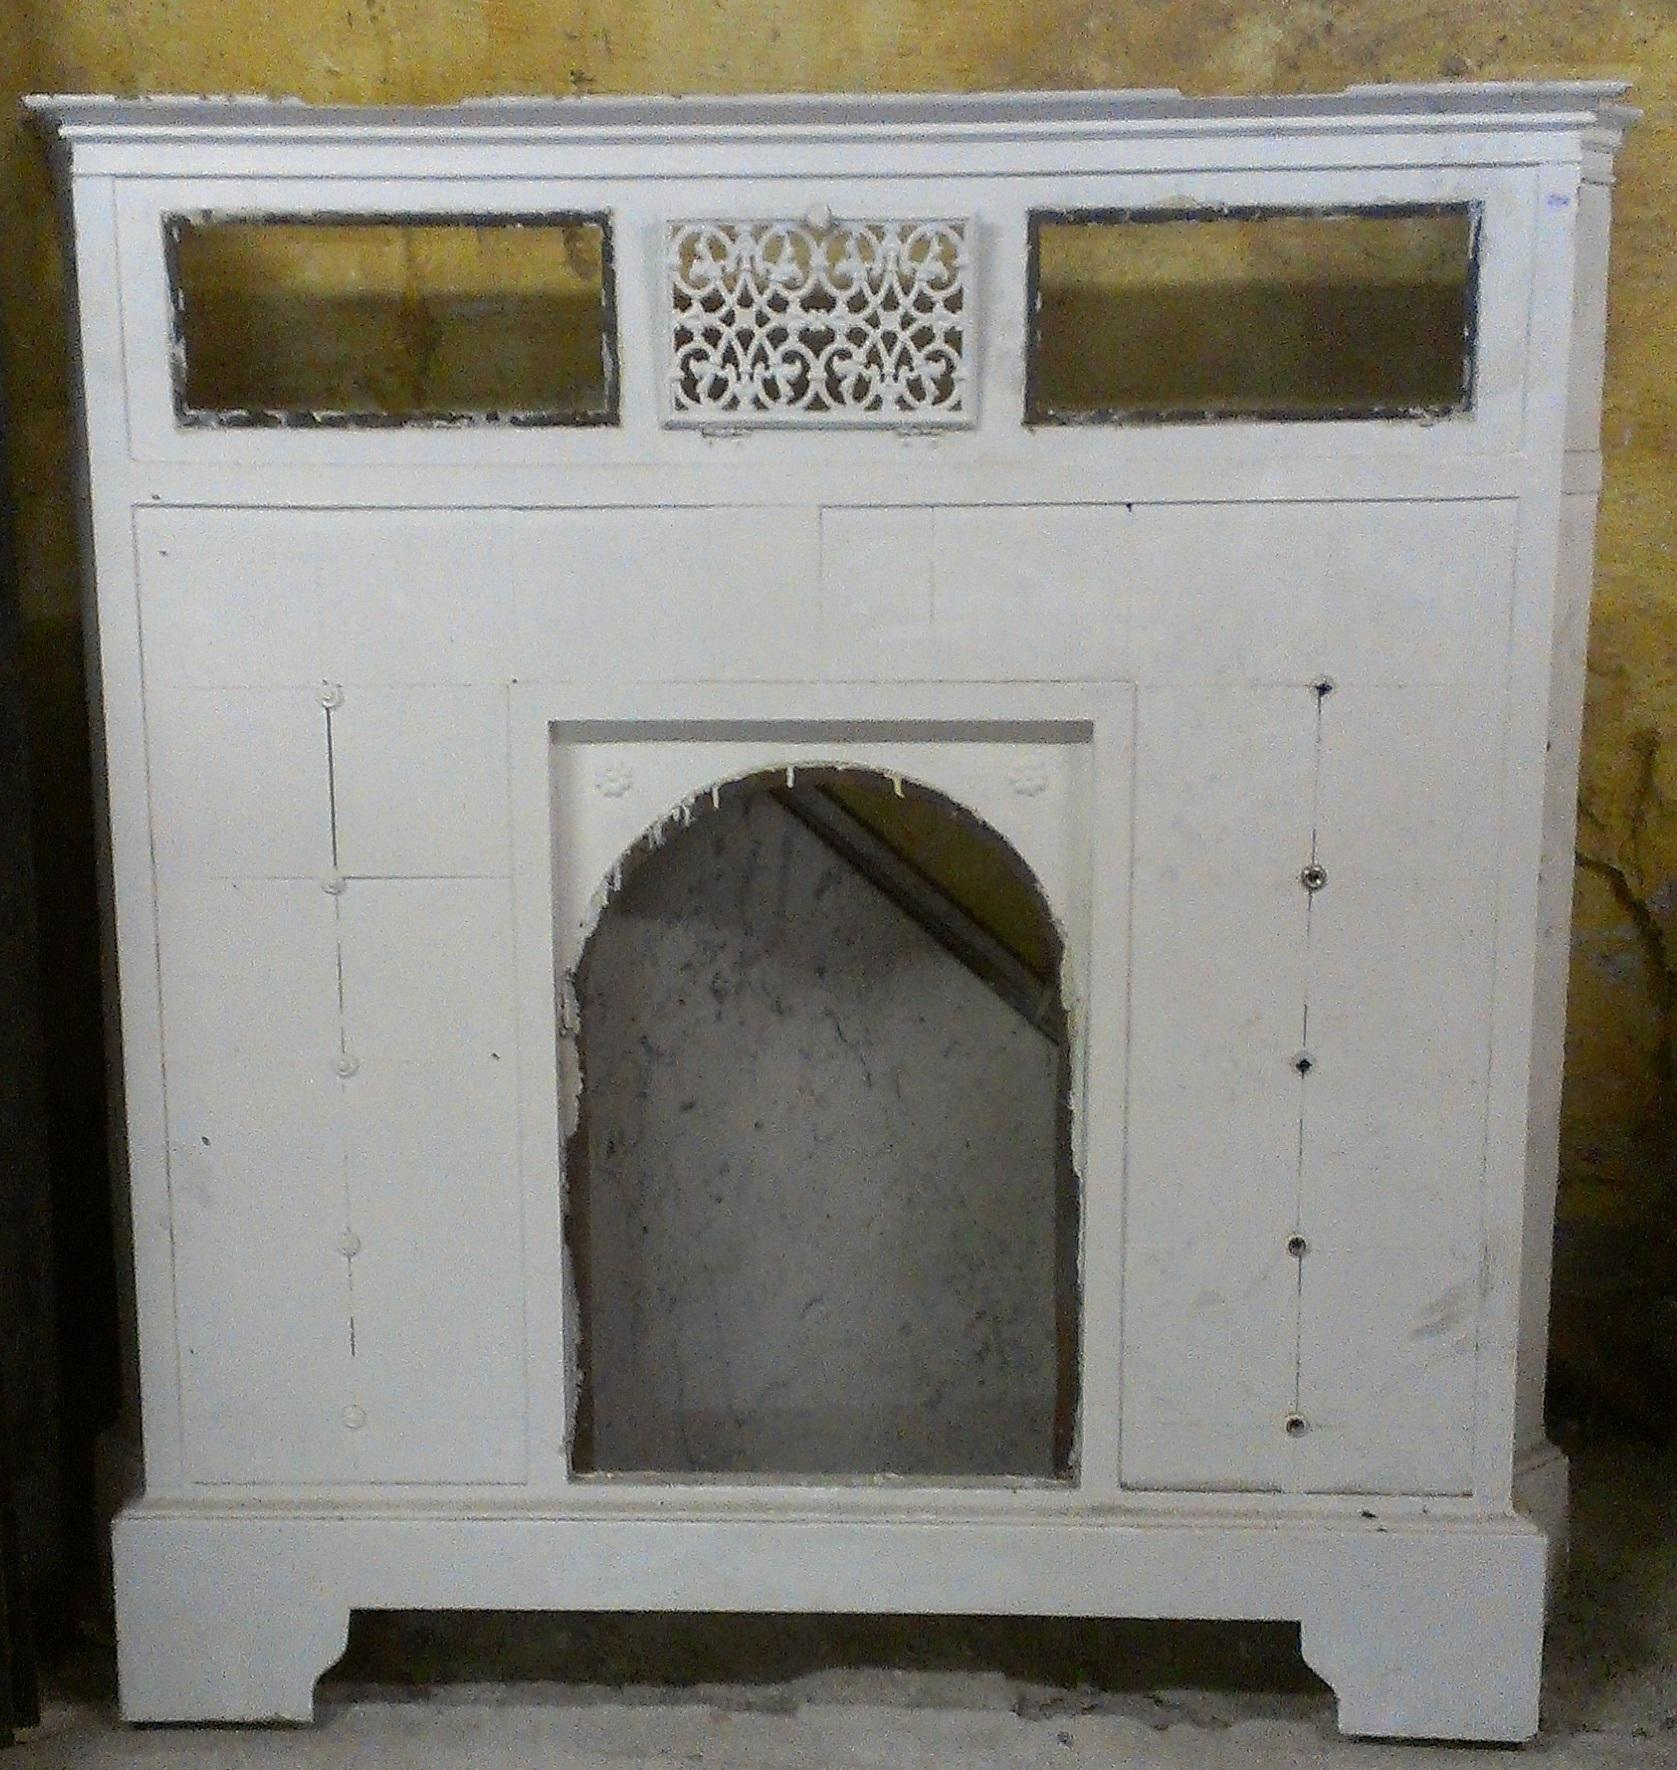 heizk rperverkleidung jugendstil 128 5 x 130 x 18 historische bauelemente jetzt online. Black Bedroom Furniture Sets. Home Design Ideas